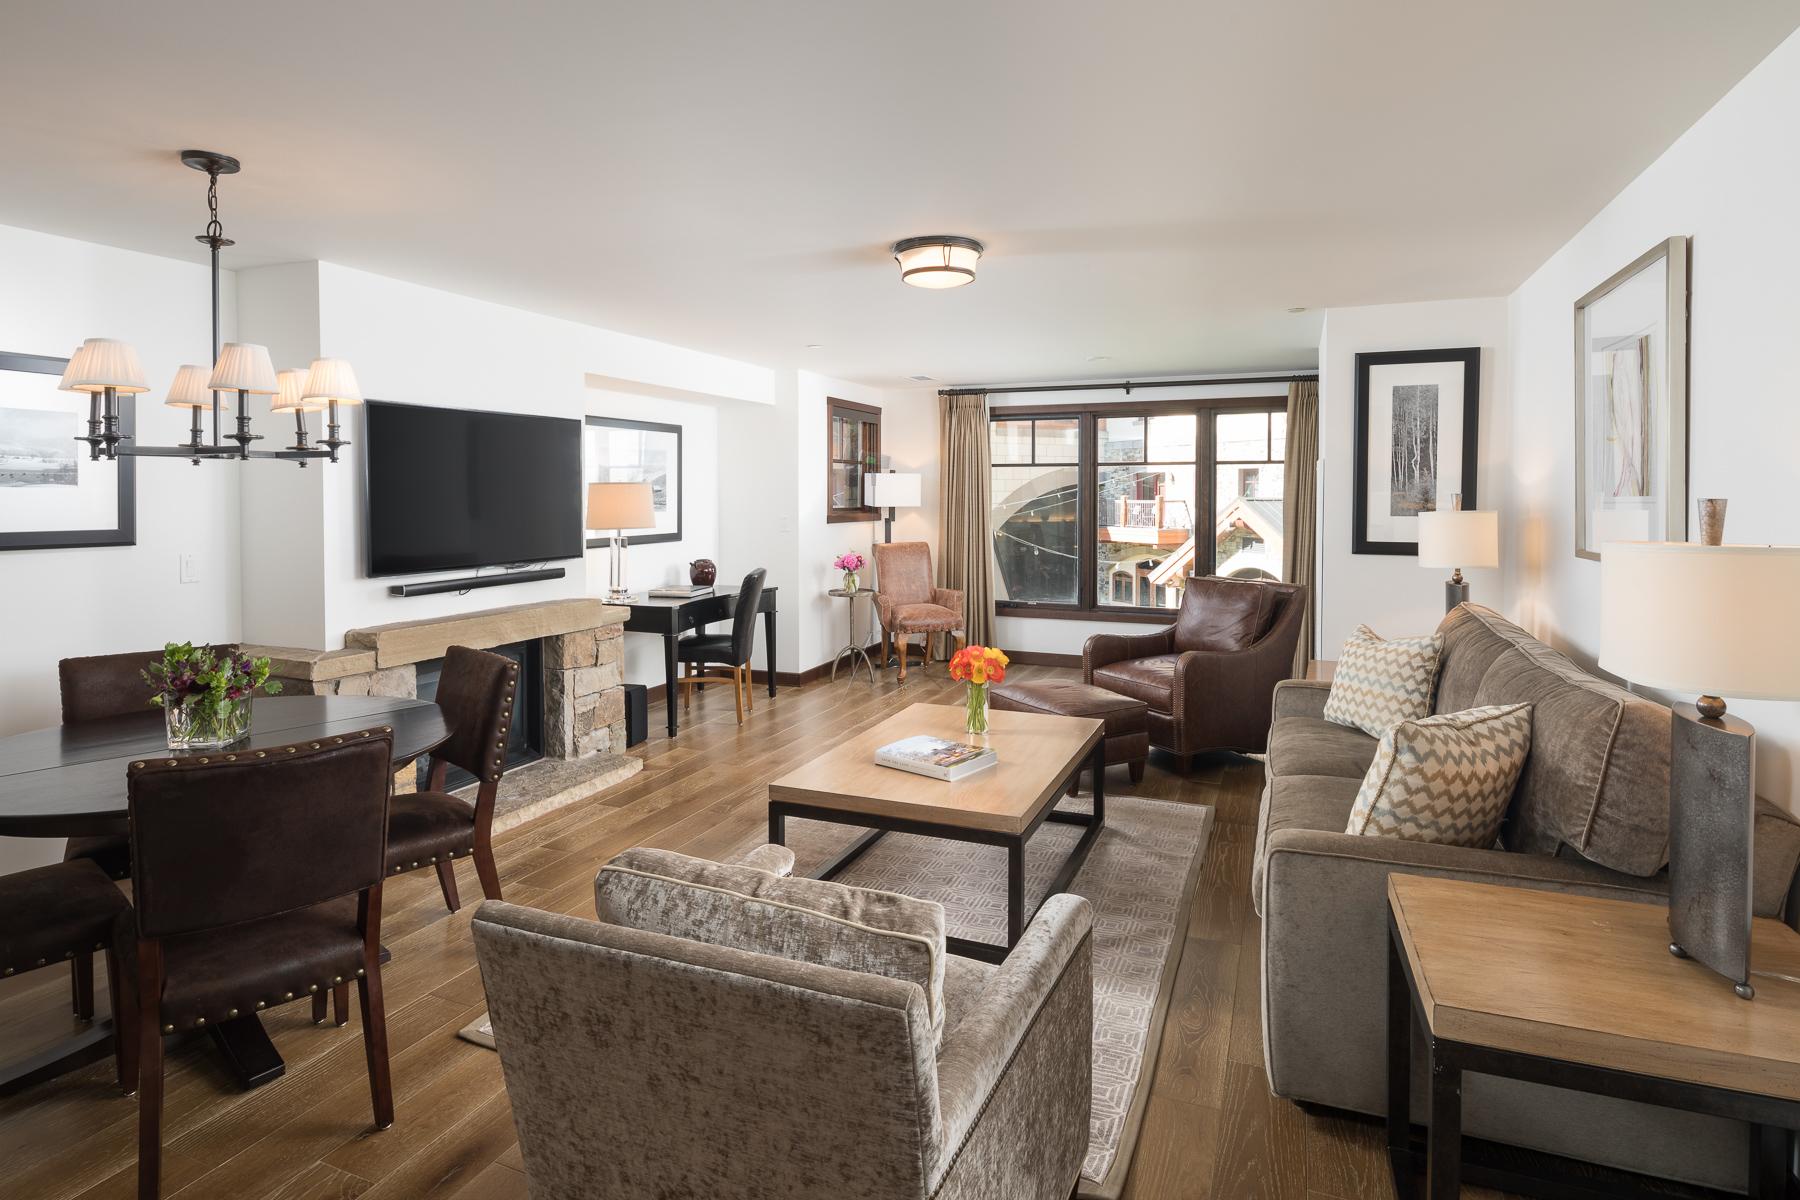 Nhà chung cư vì Bán tại Residence 1204, Madeline Hotel & Residences 568 Mountain Village Boulevard, Residence 1204 Telluride, Colorado, 81435 Hoa Kỳ